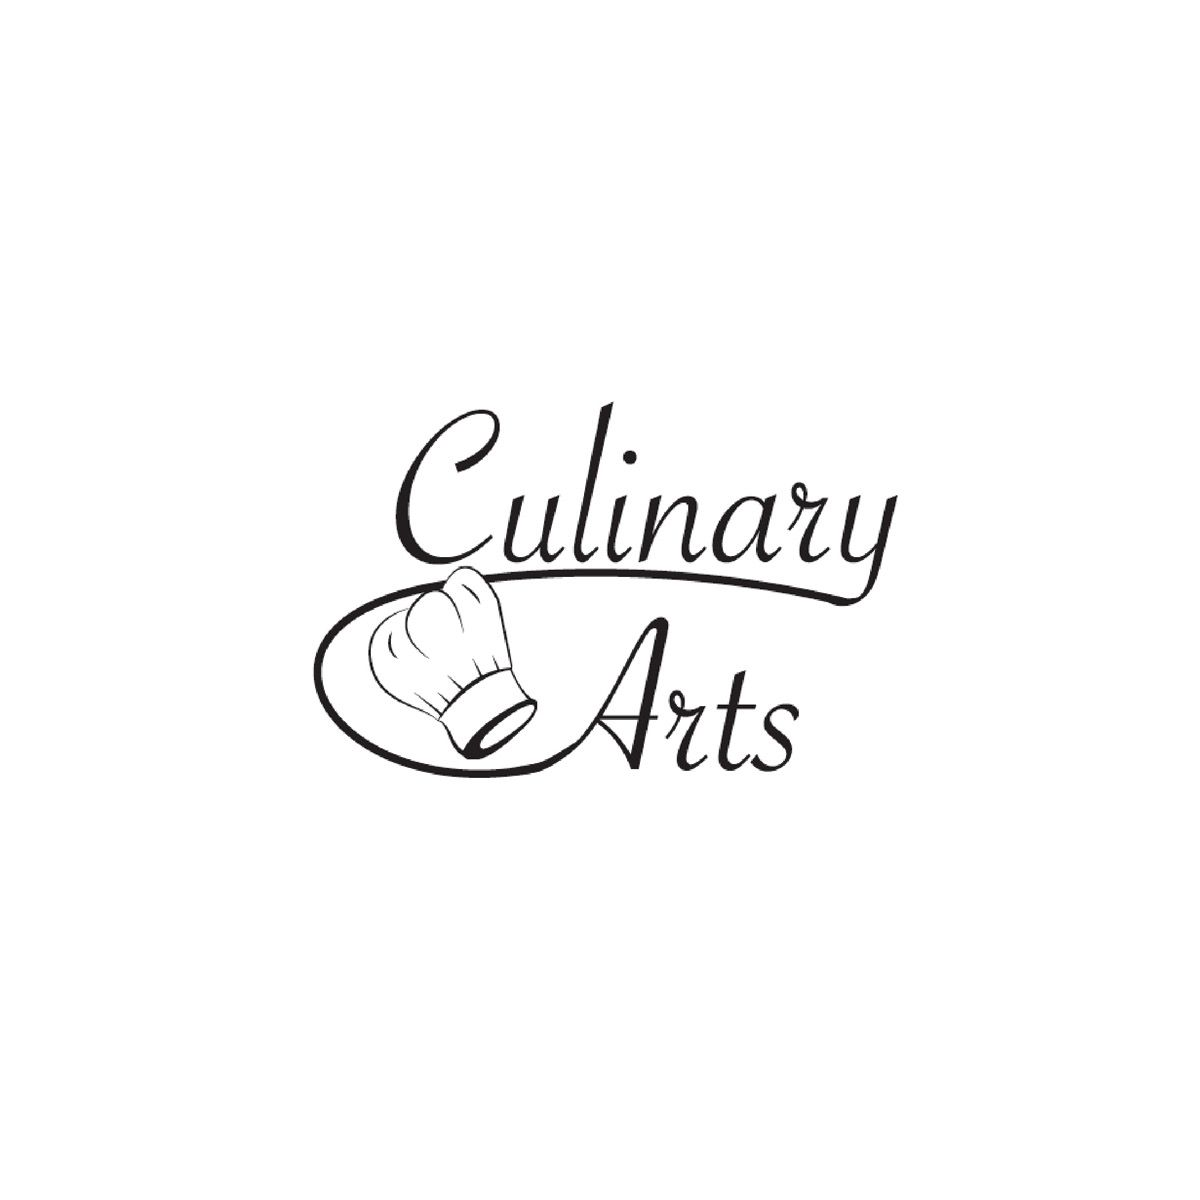 Culinary Arts Logos Art Logo Culinary Arts Logo Design